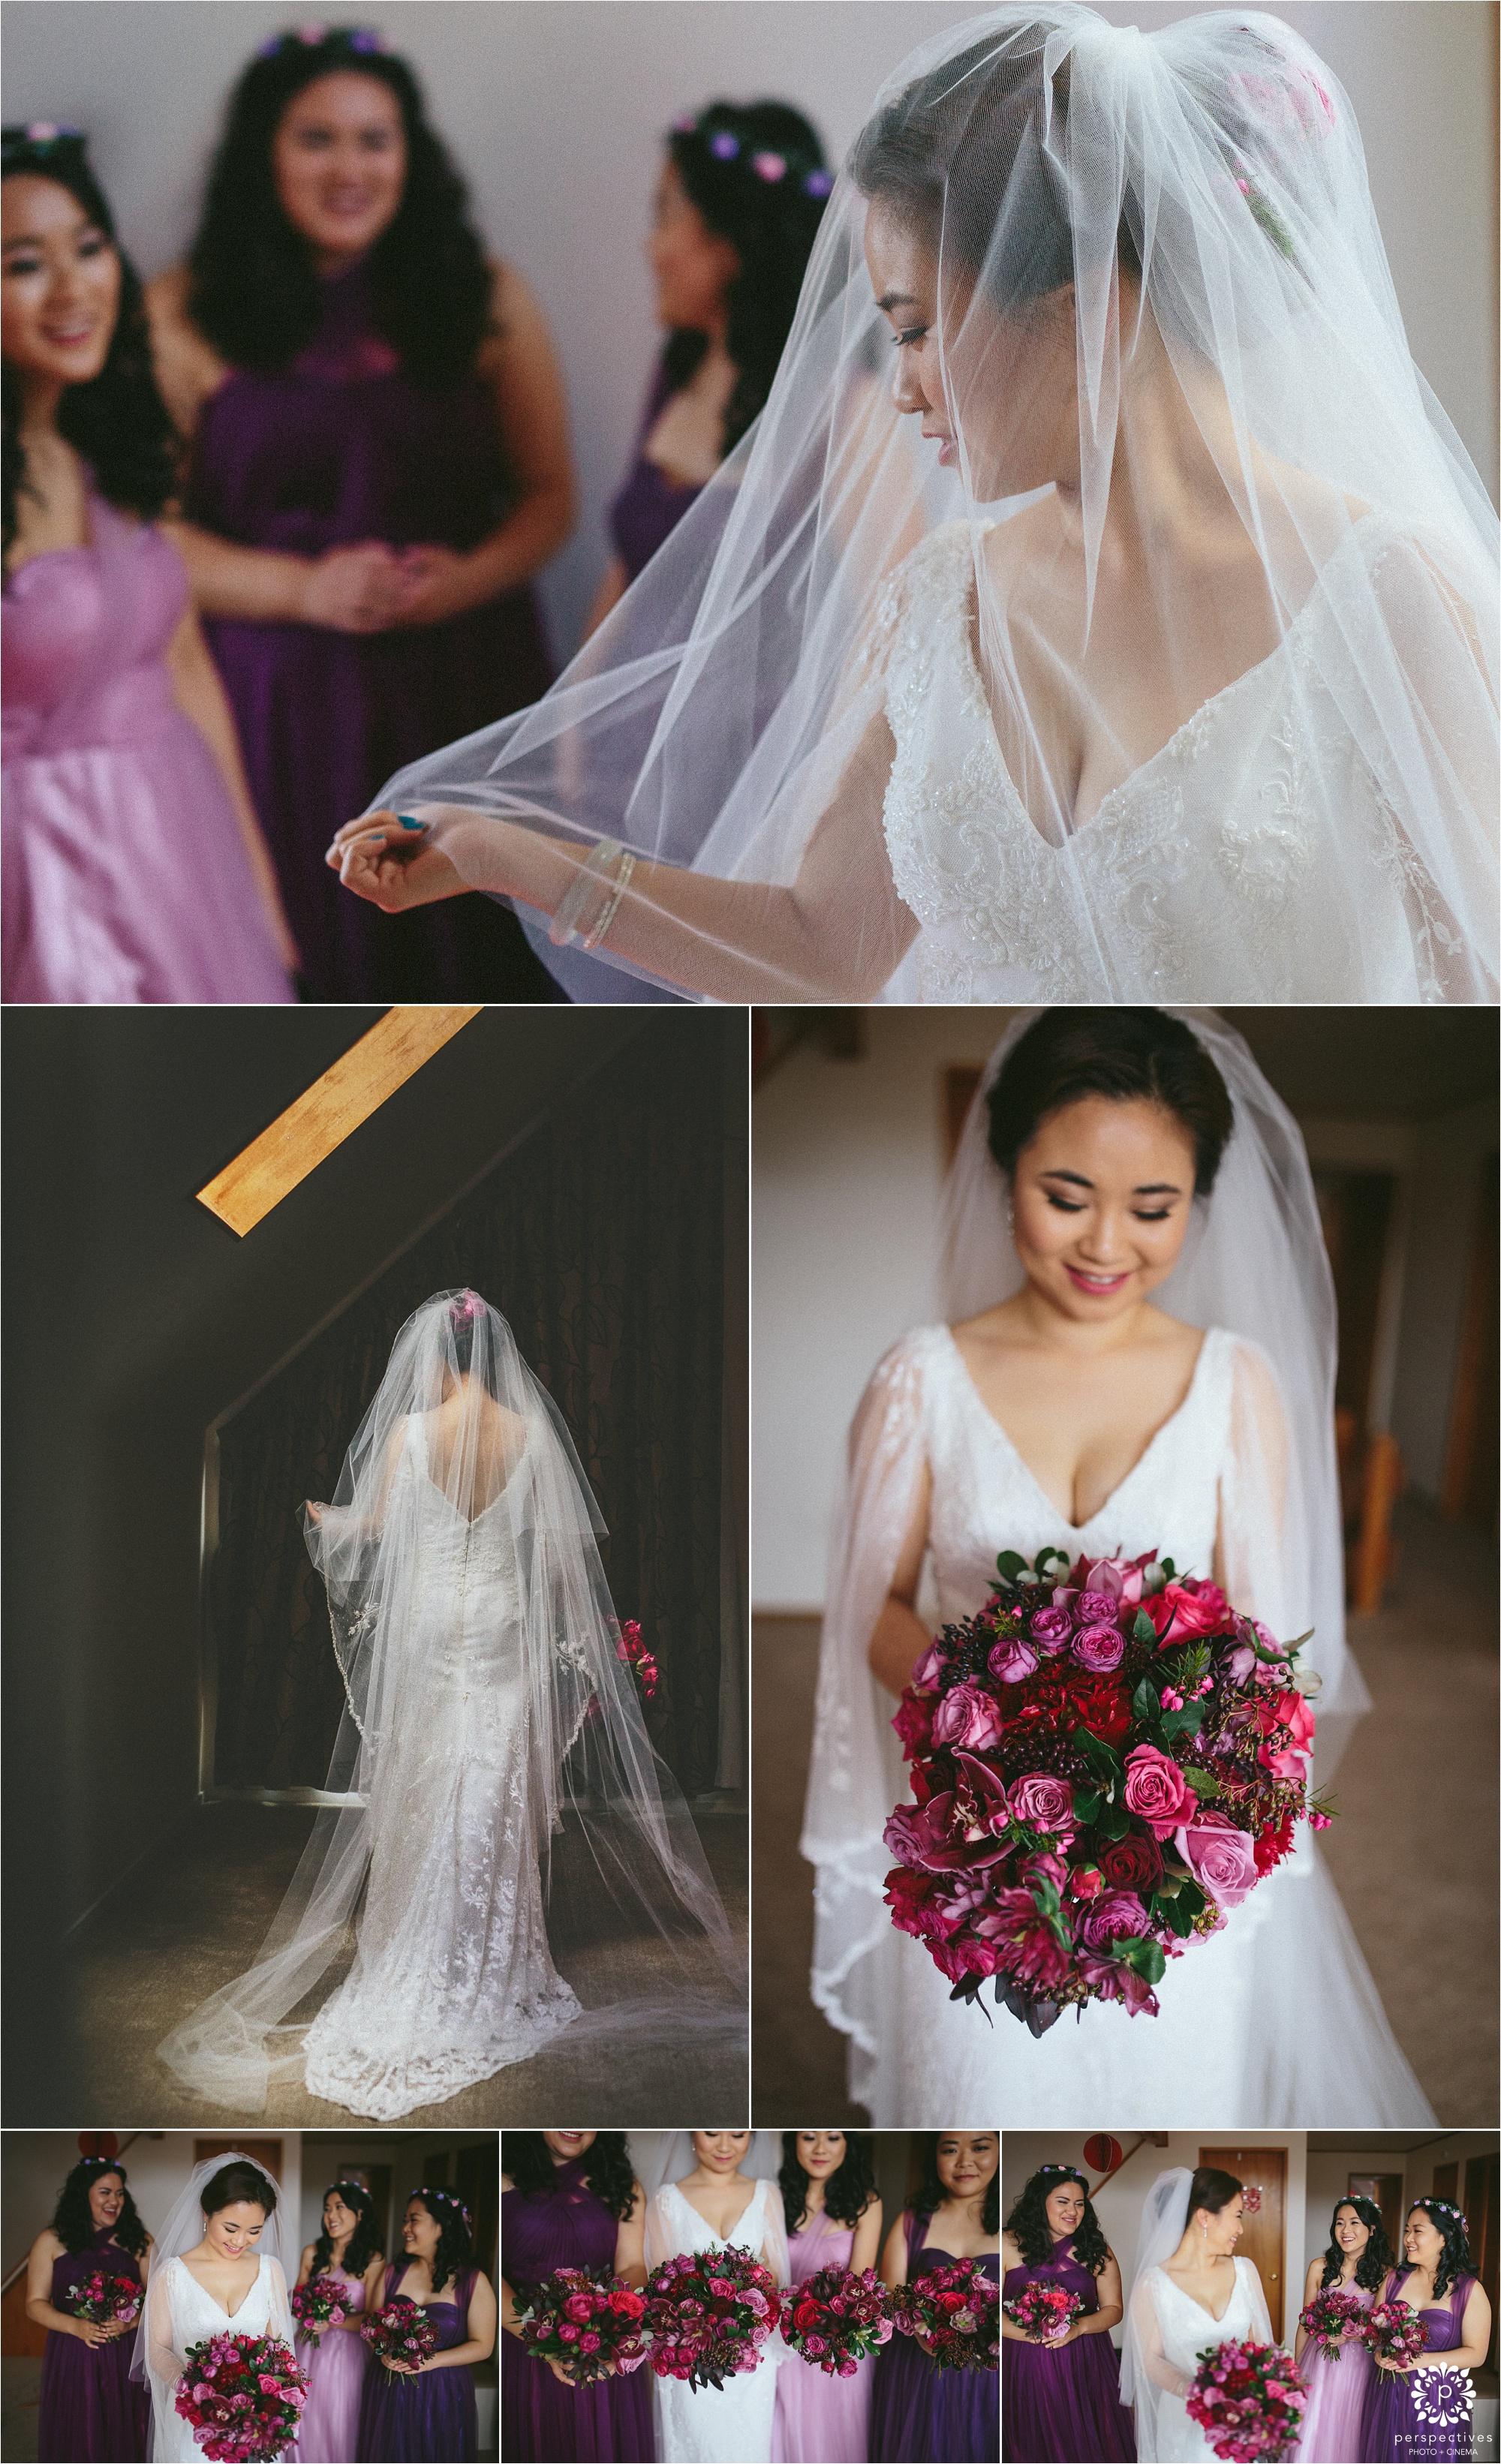 Vinka bridal gowns Auckland wedding photos